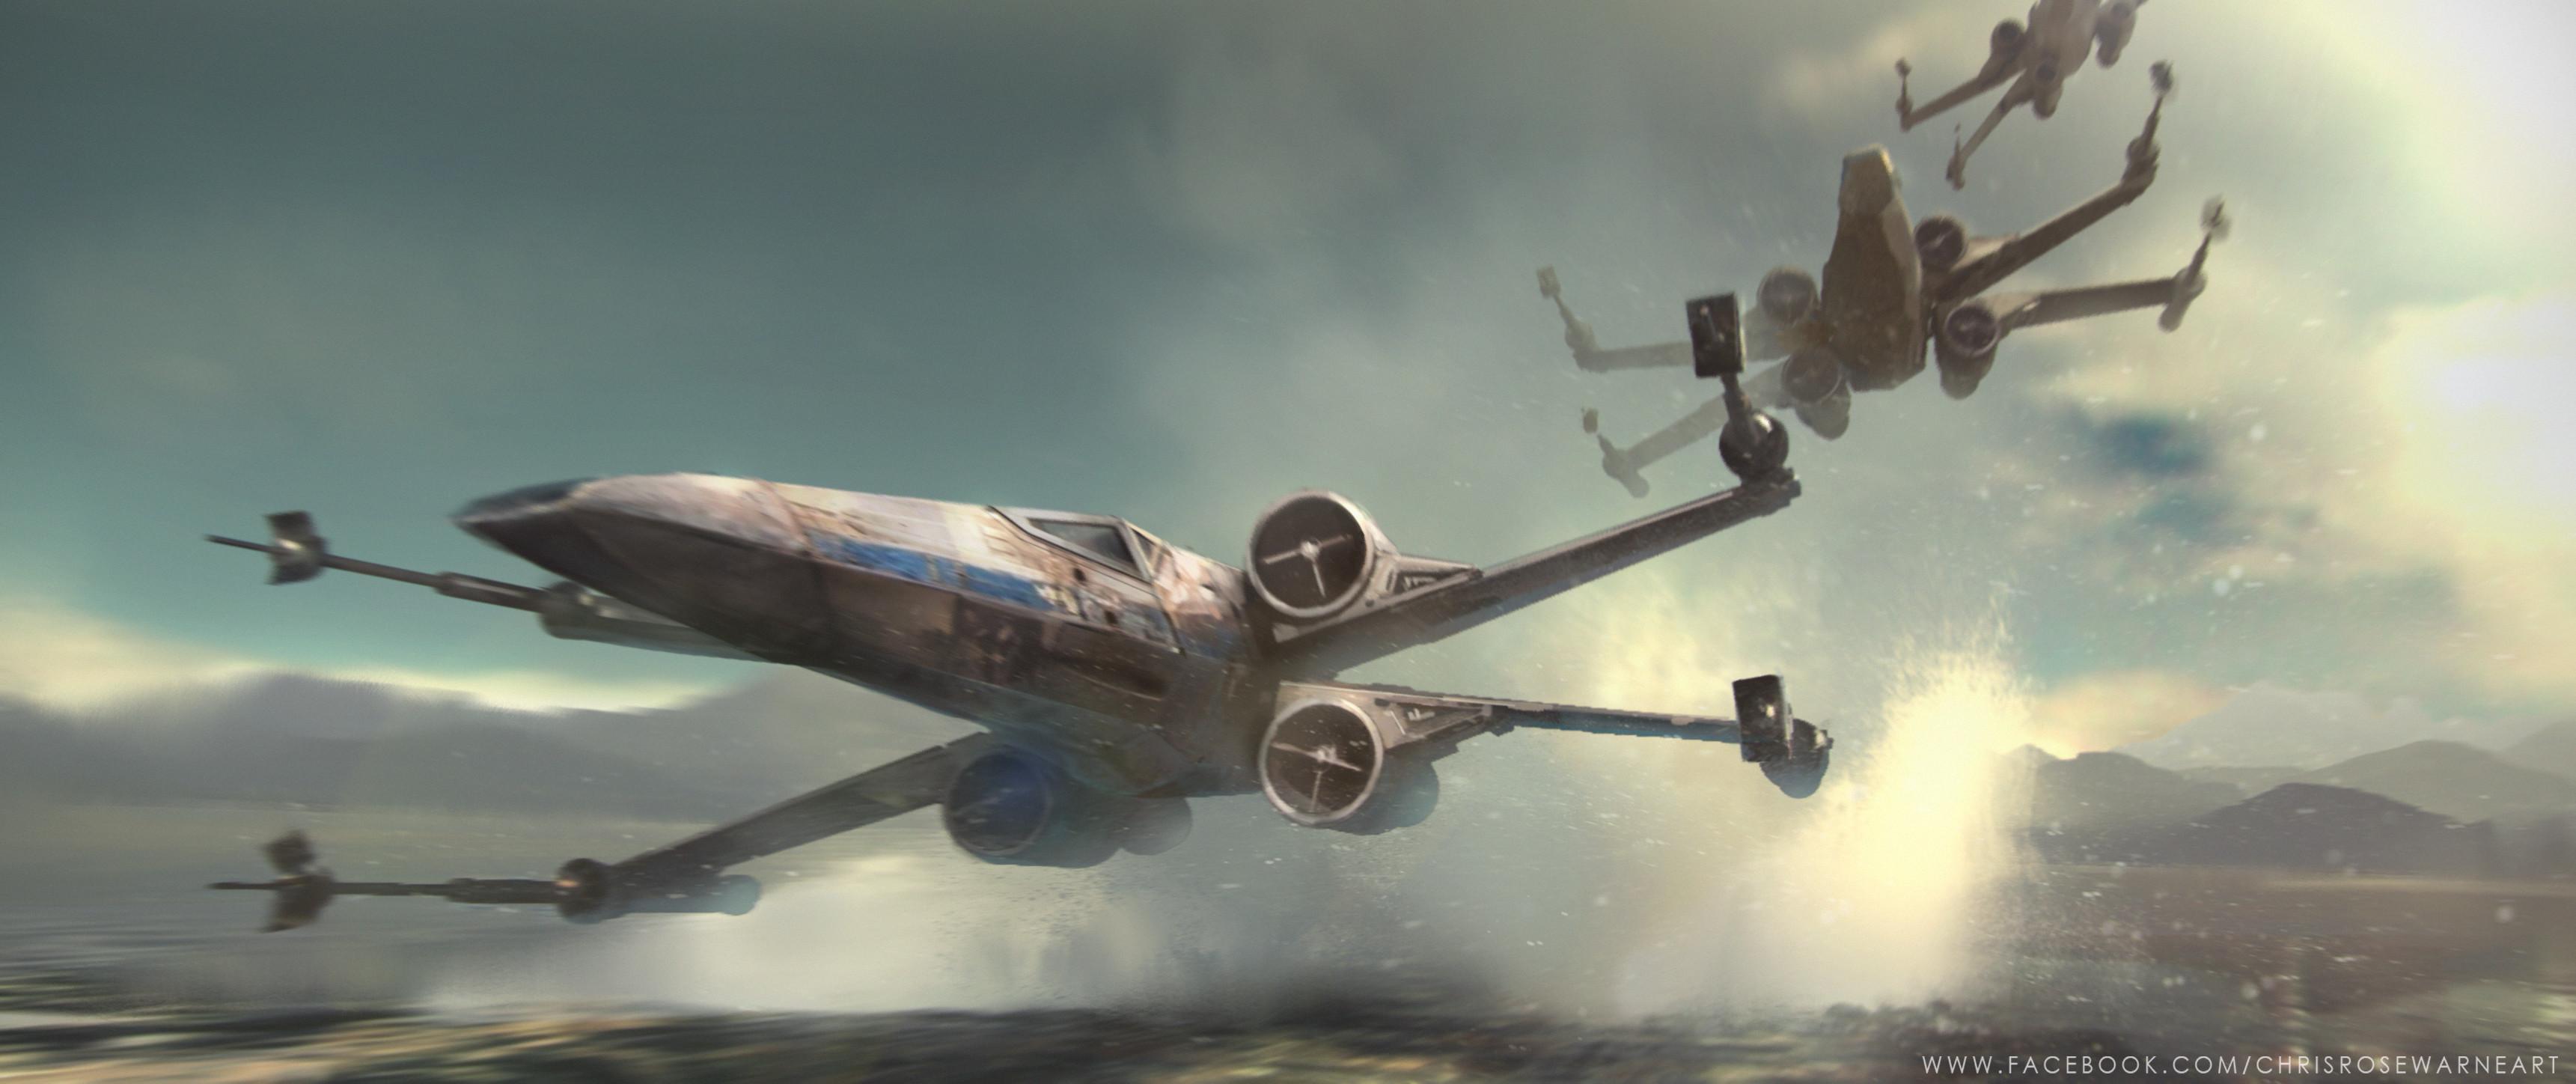 star wars concept art – Google Search